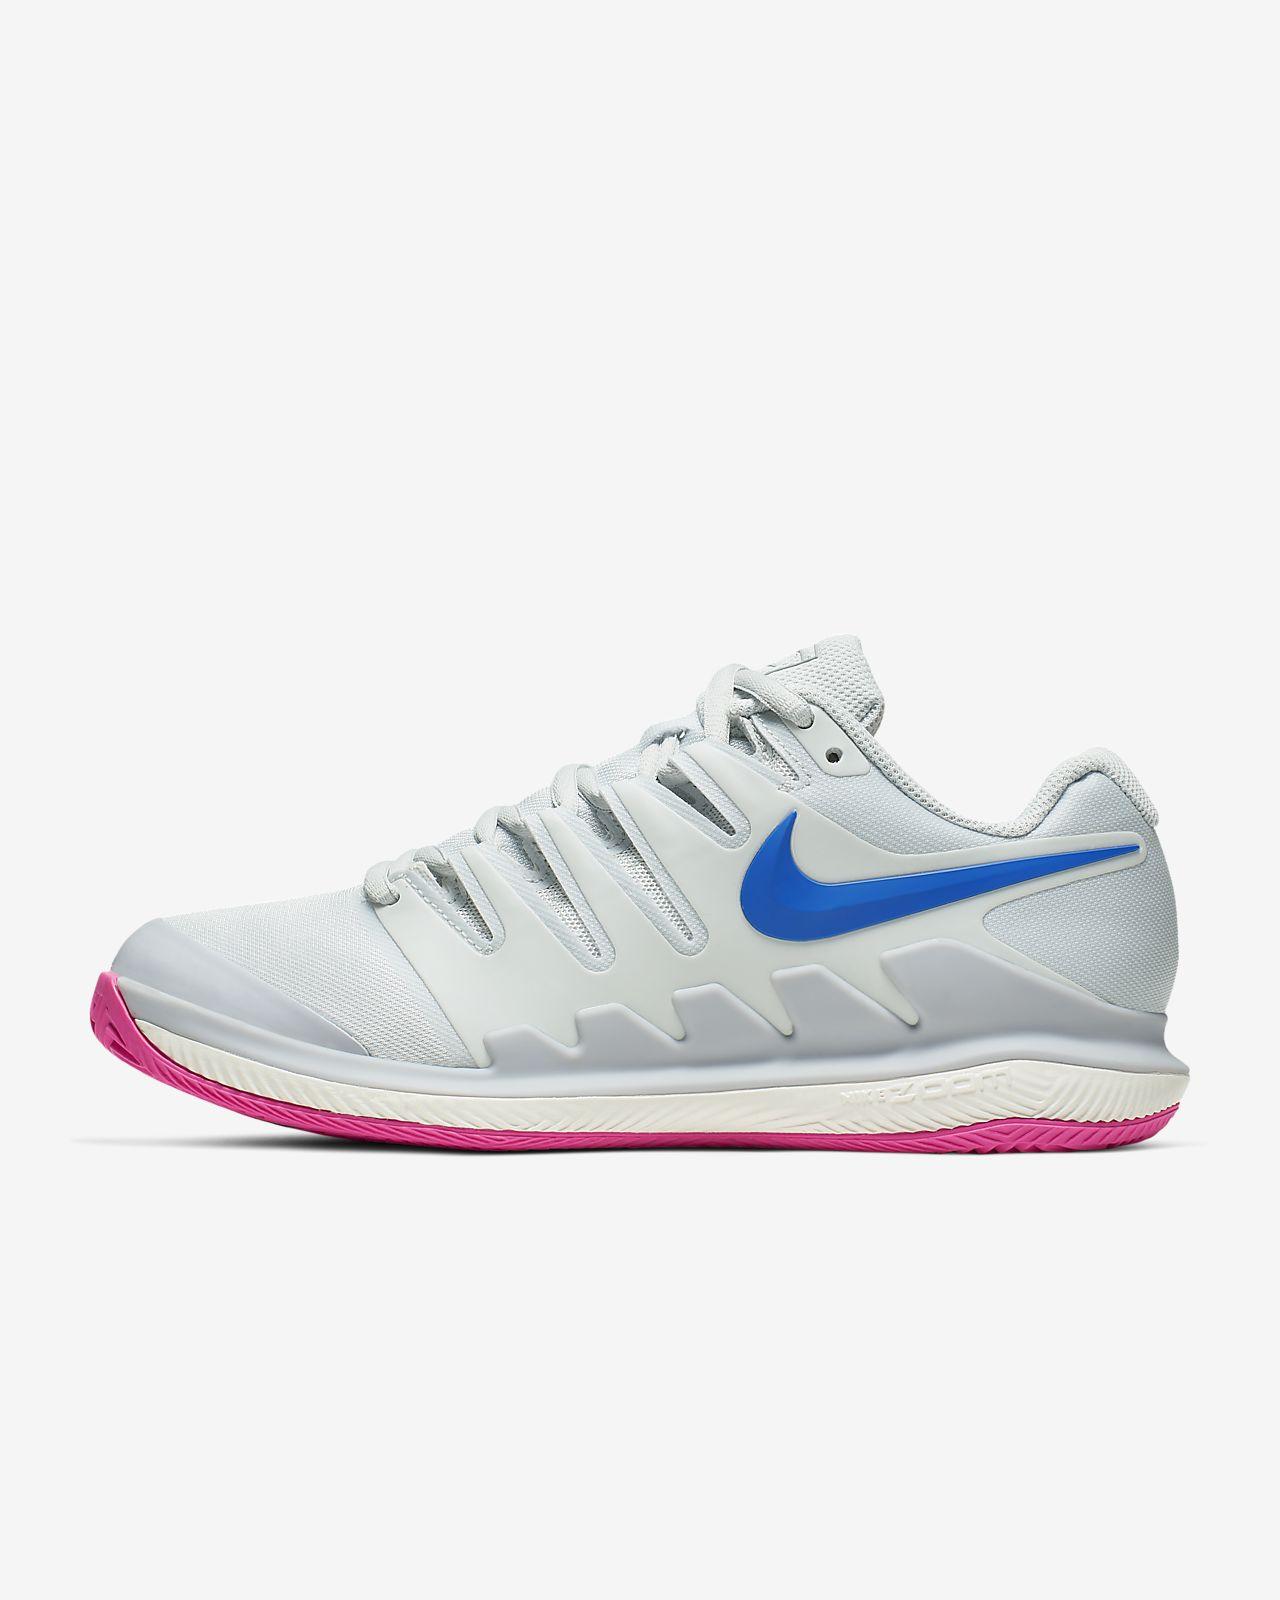 NikeCourt Air Zoom Vapor X Women's Clay Tennis Shoe